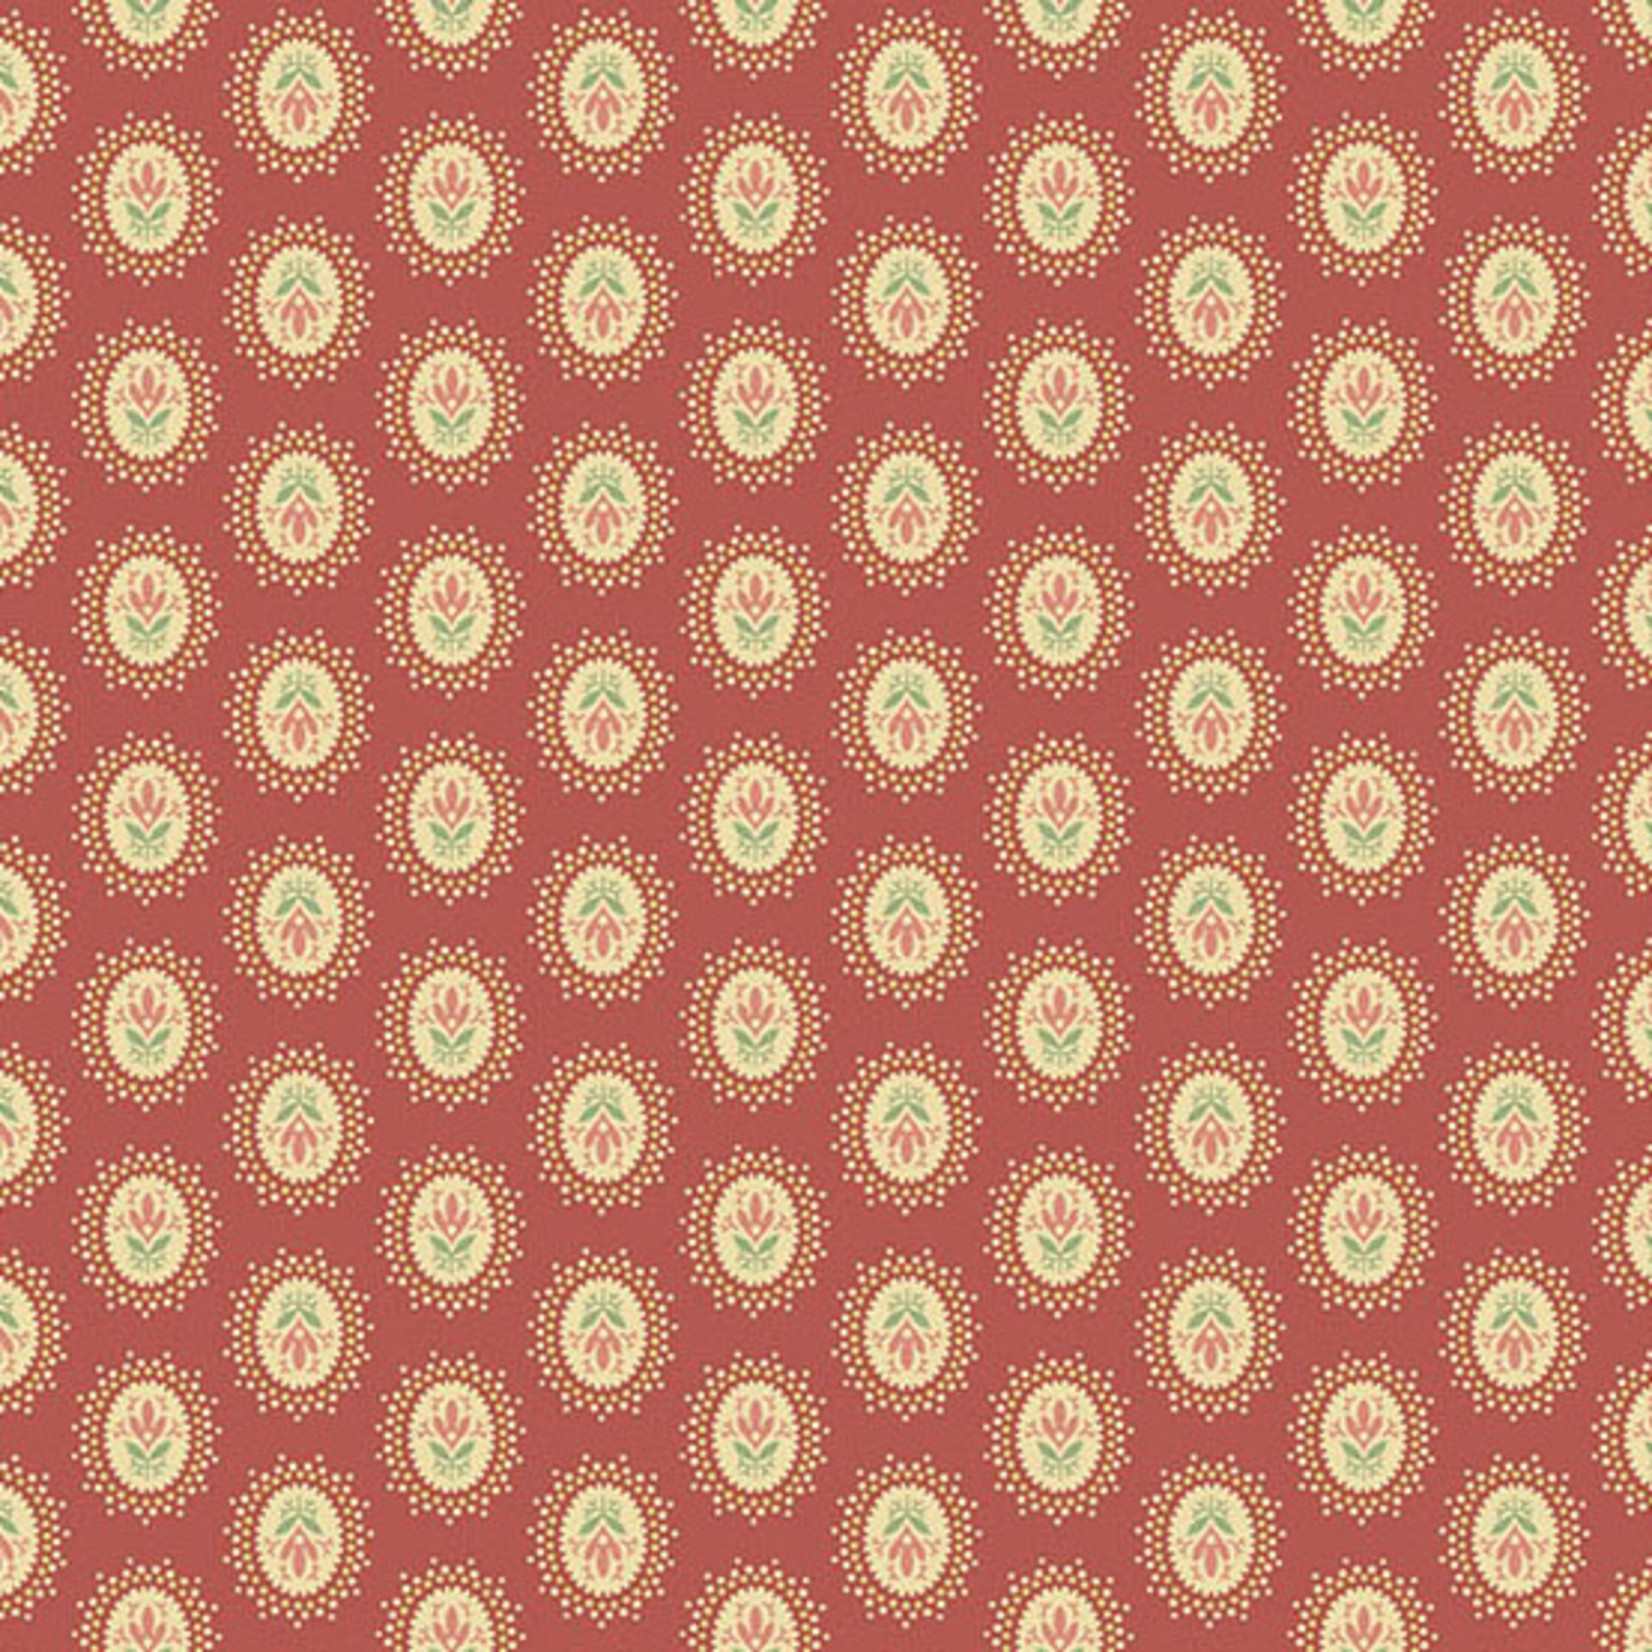 Edyta Sitar Secret Stash - Warms, Medallion, Pink (8616-E) $0.20 per cm or $20/m